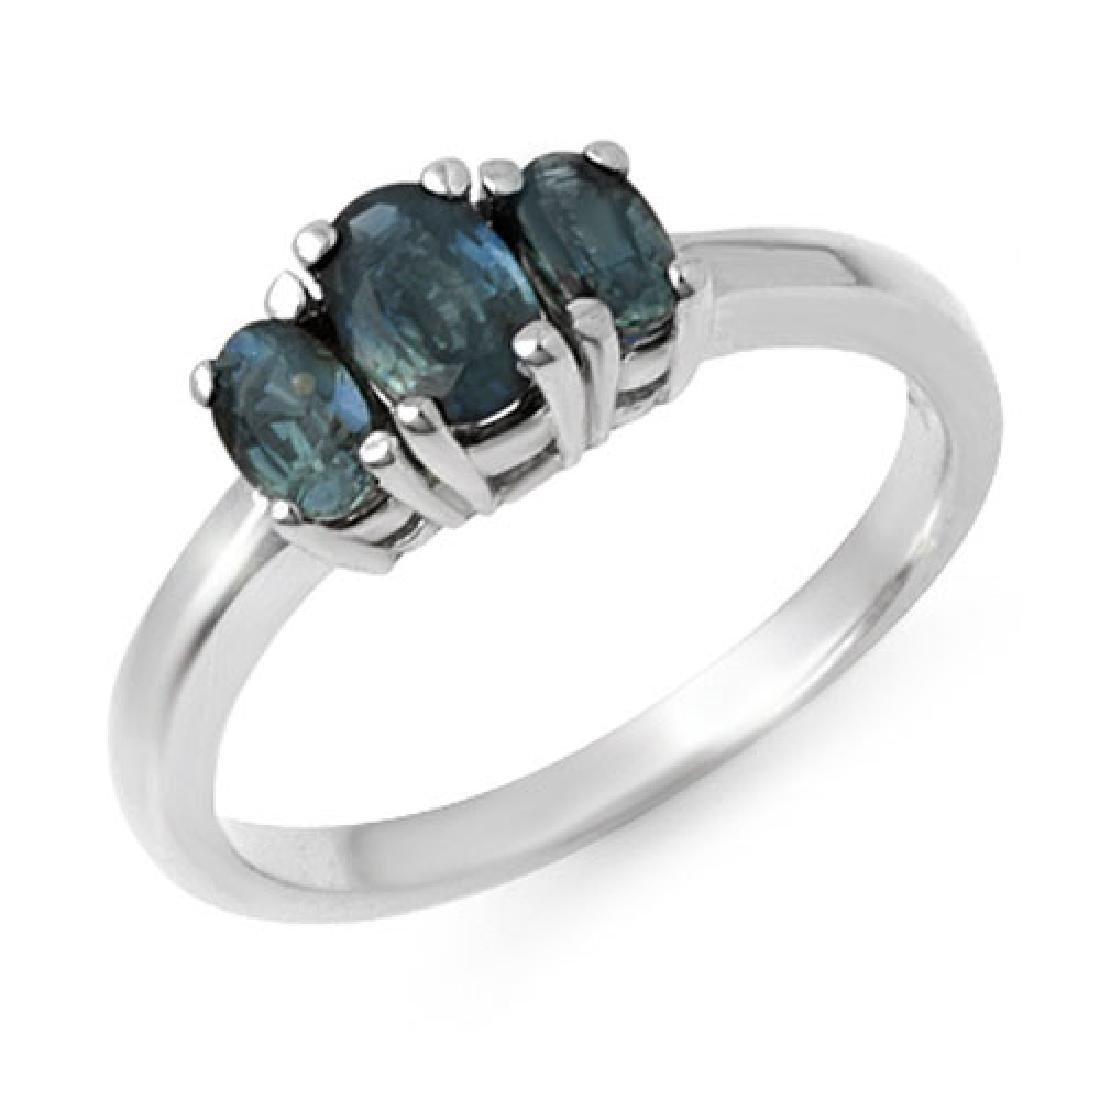 1.0 CTW Blue Sapphire Ring 18K White Gold